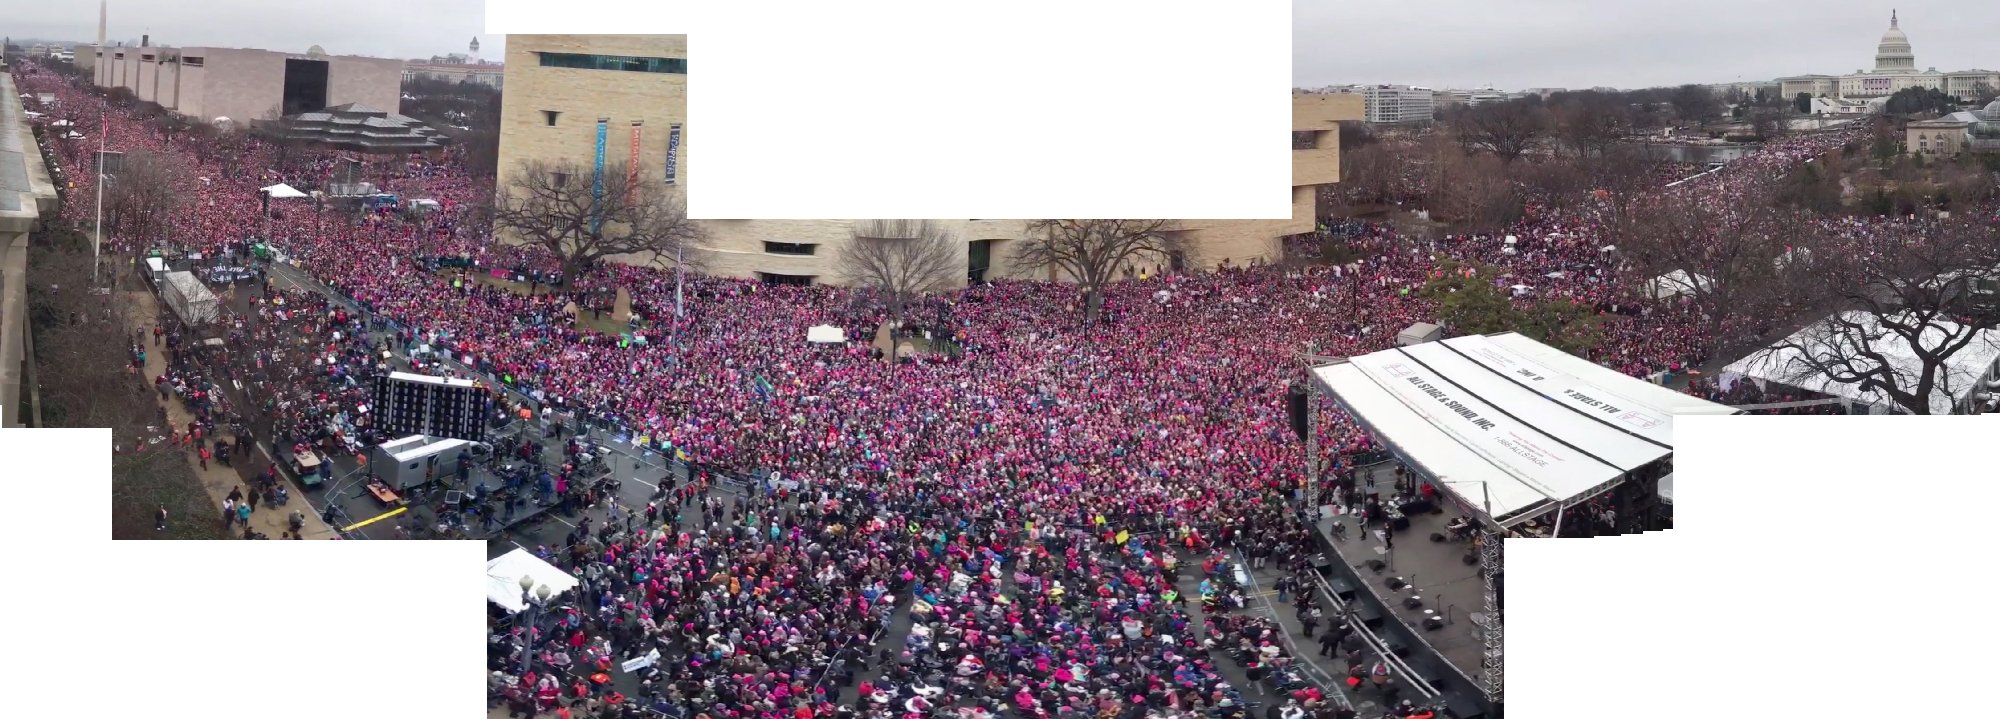 Trump's right Washington crowd WAS huge